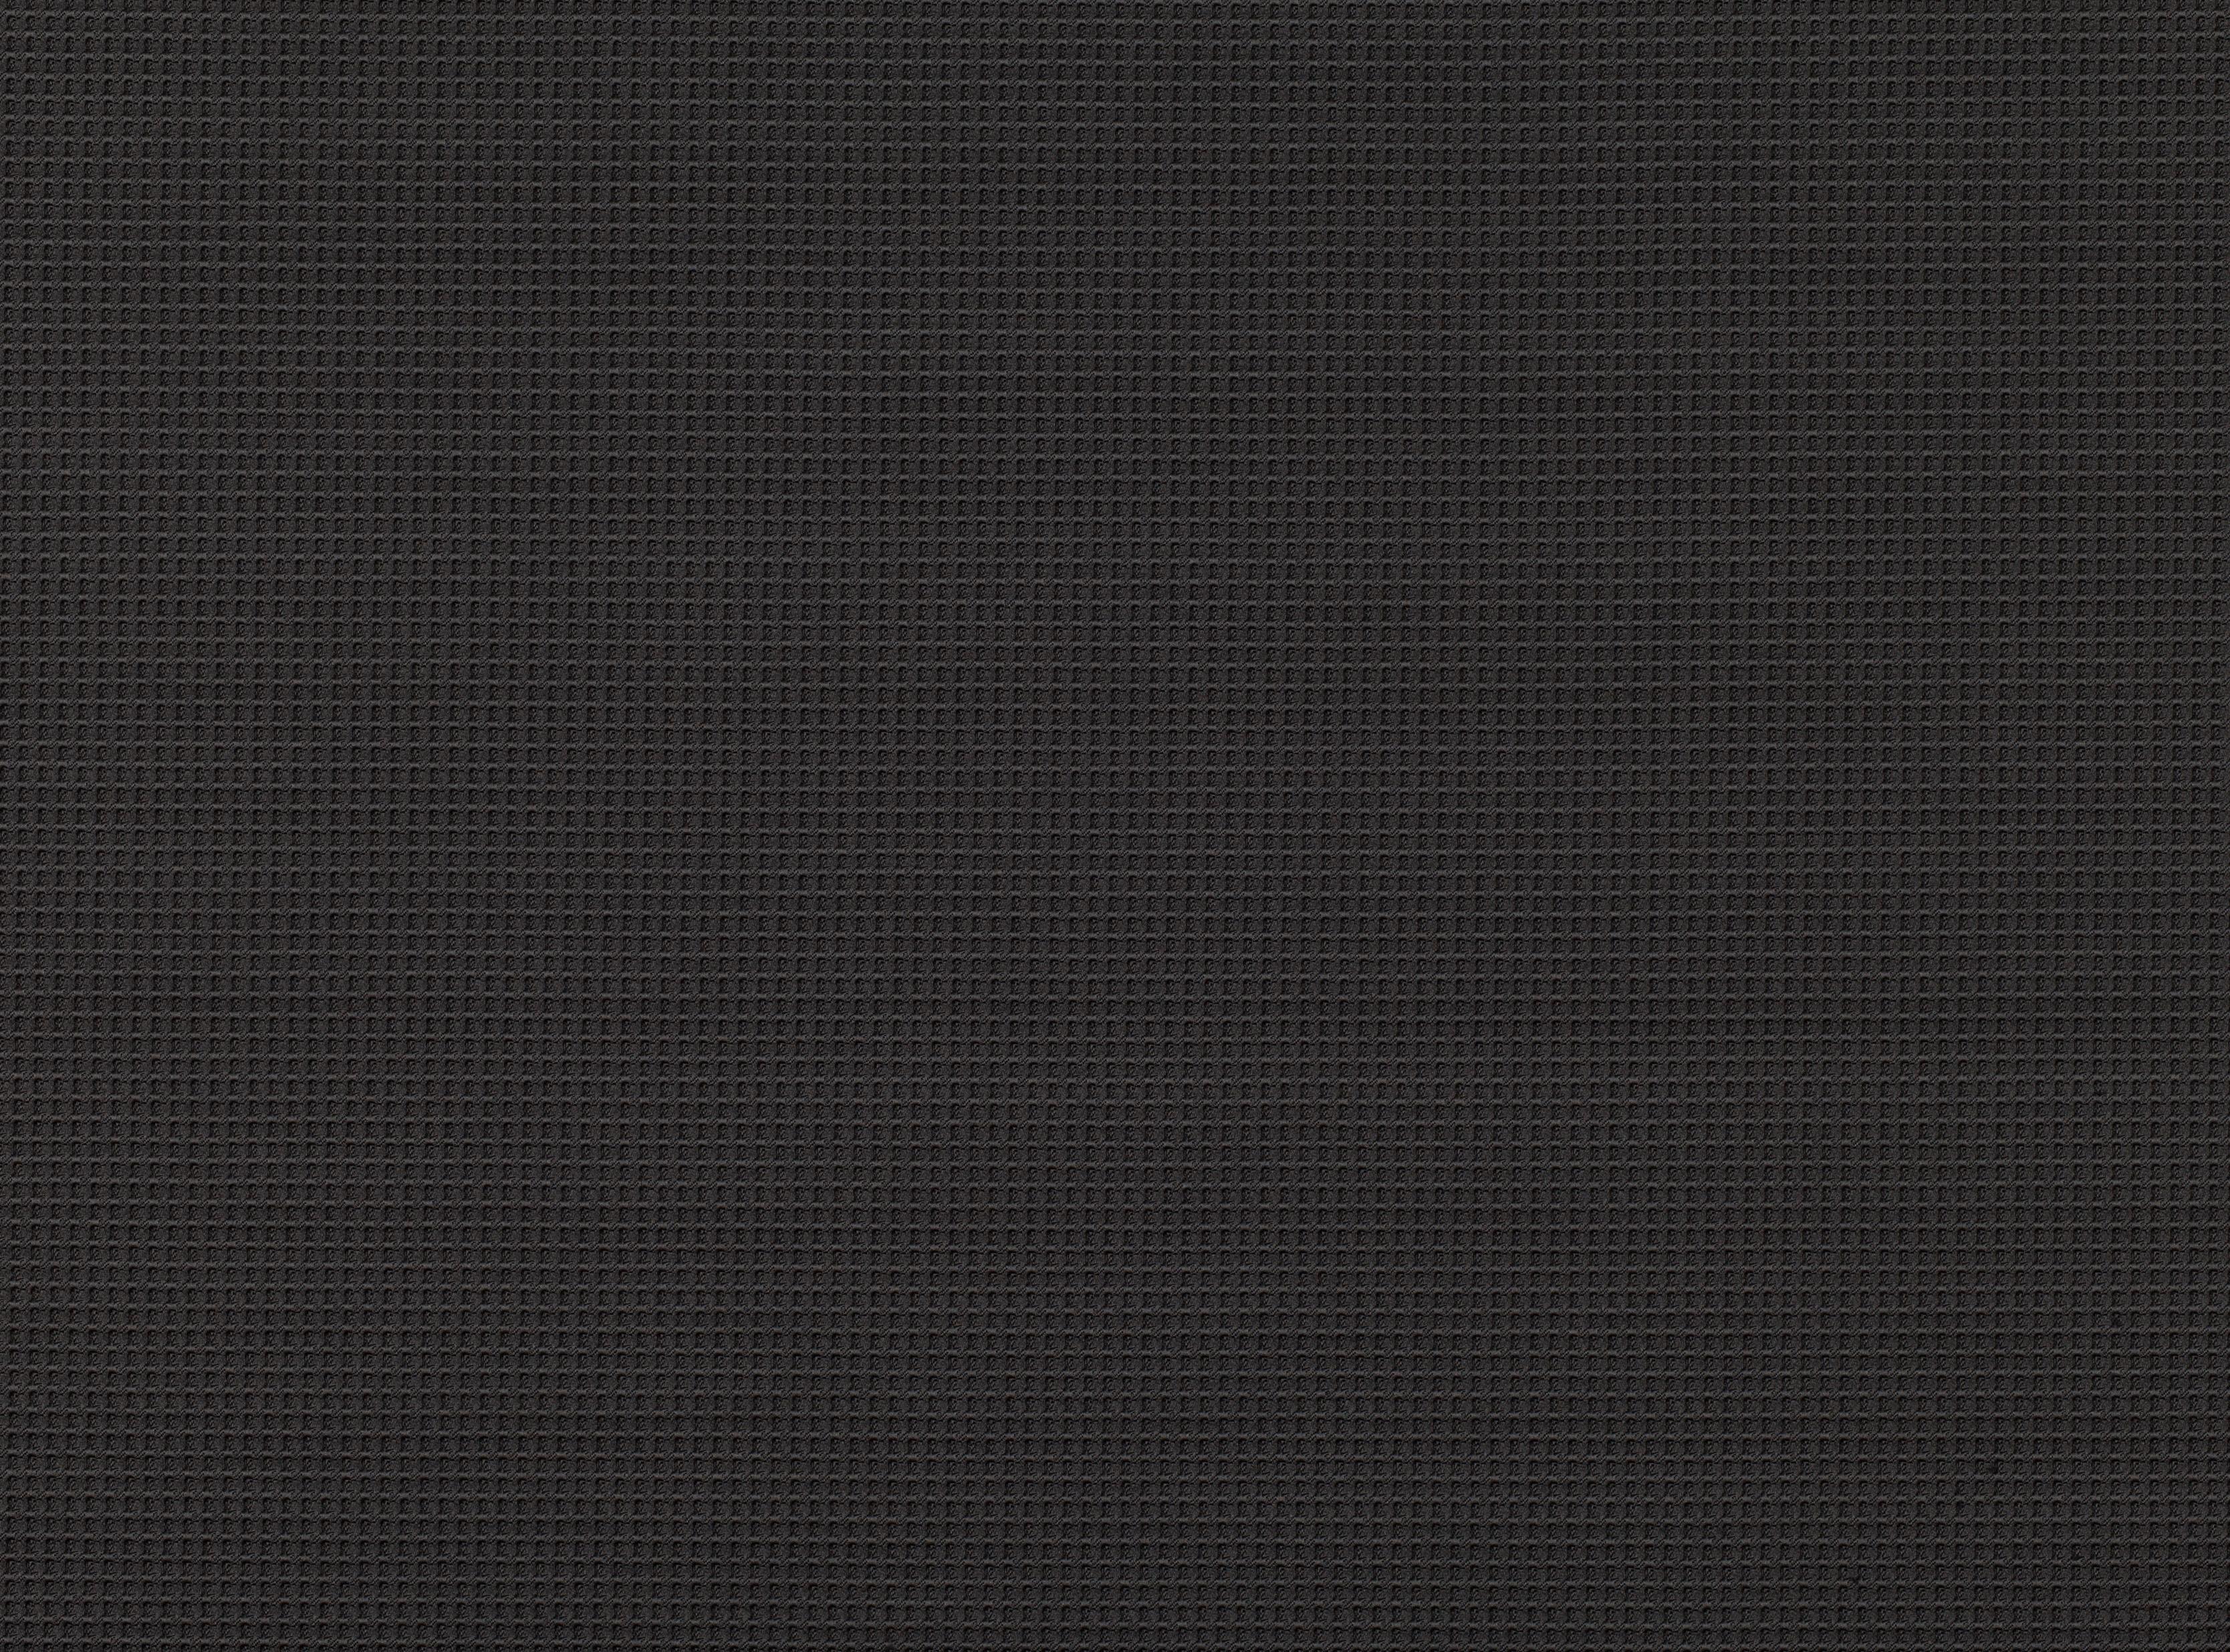 7594/01